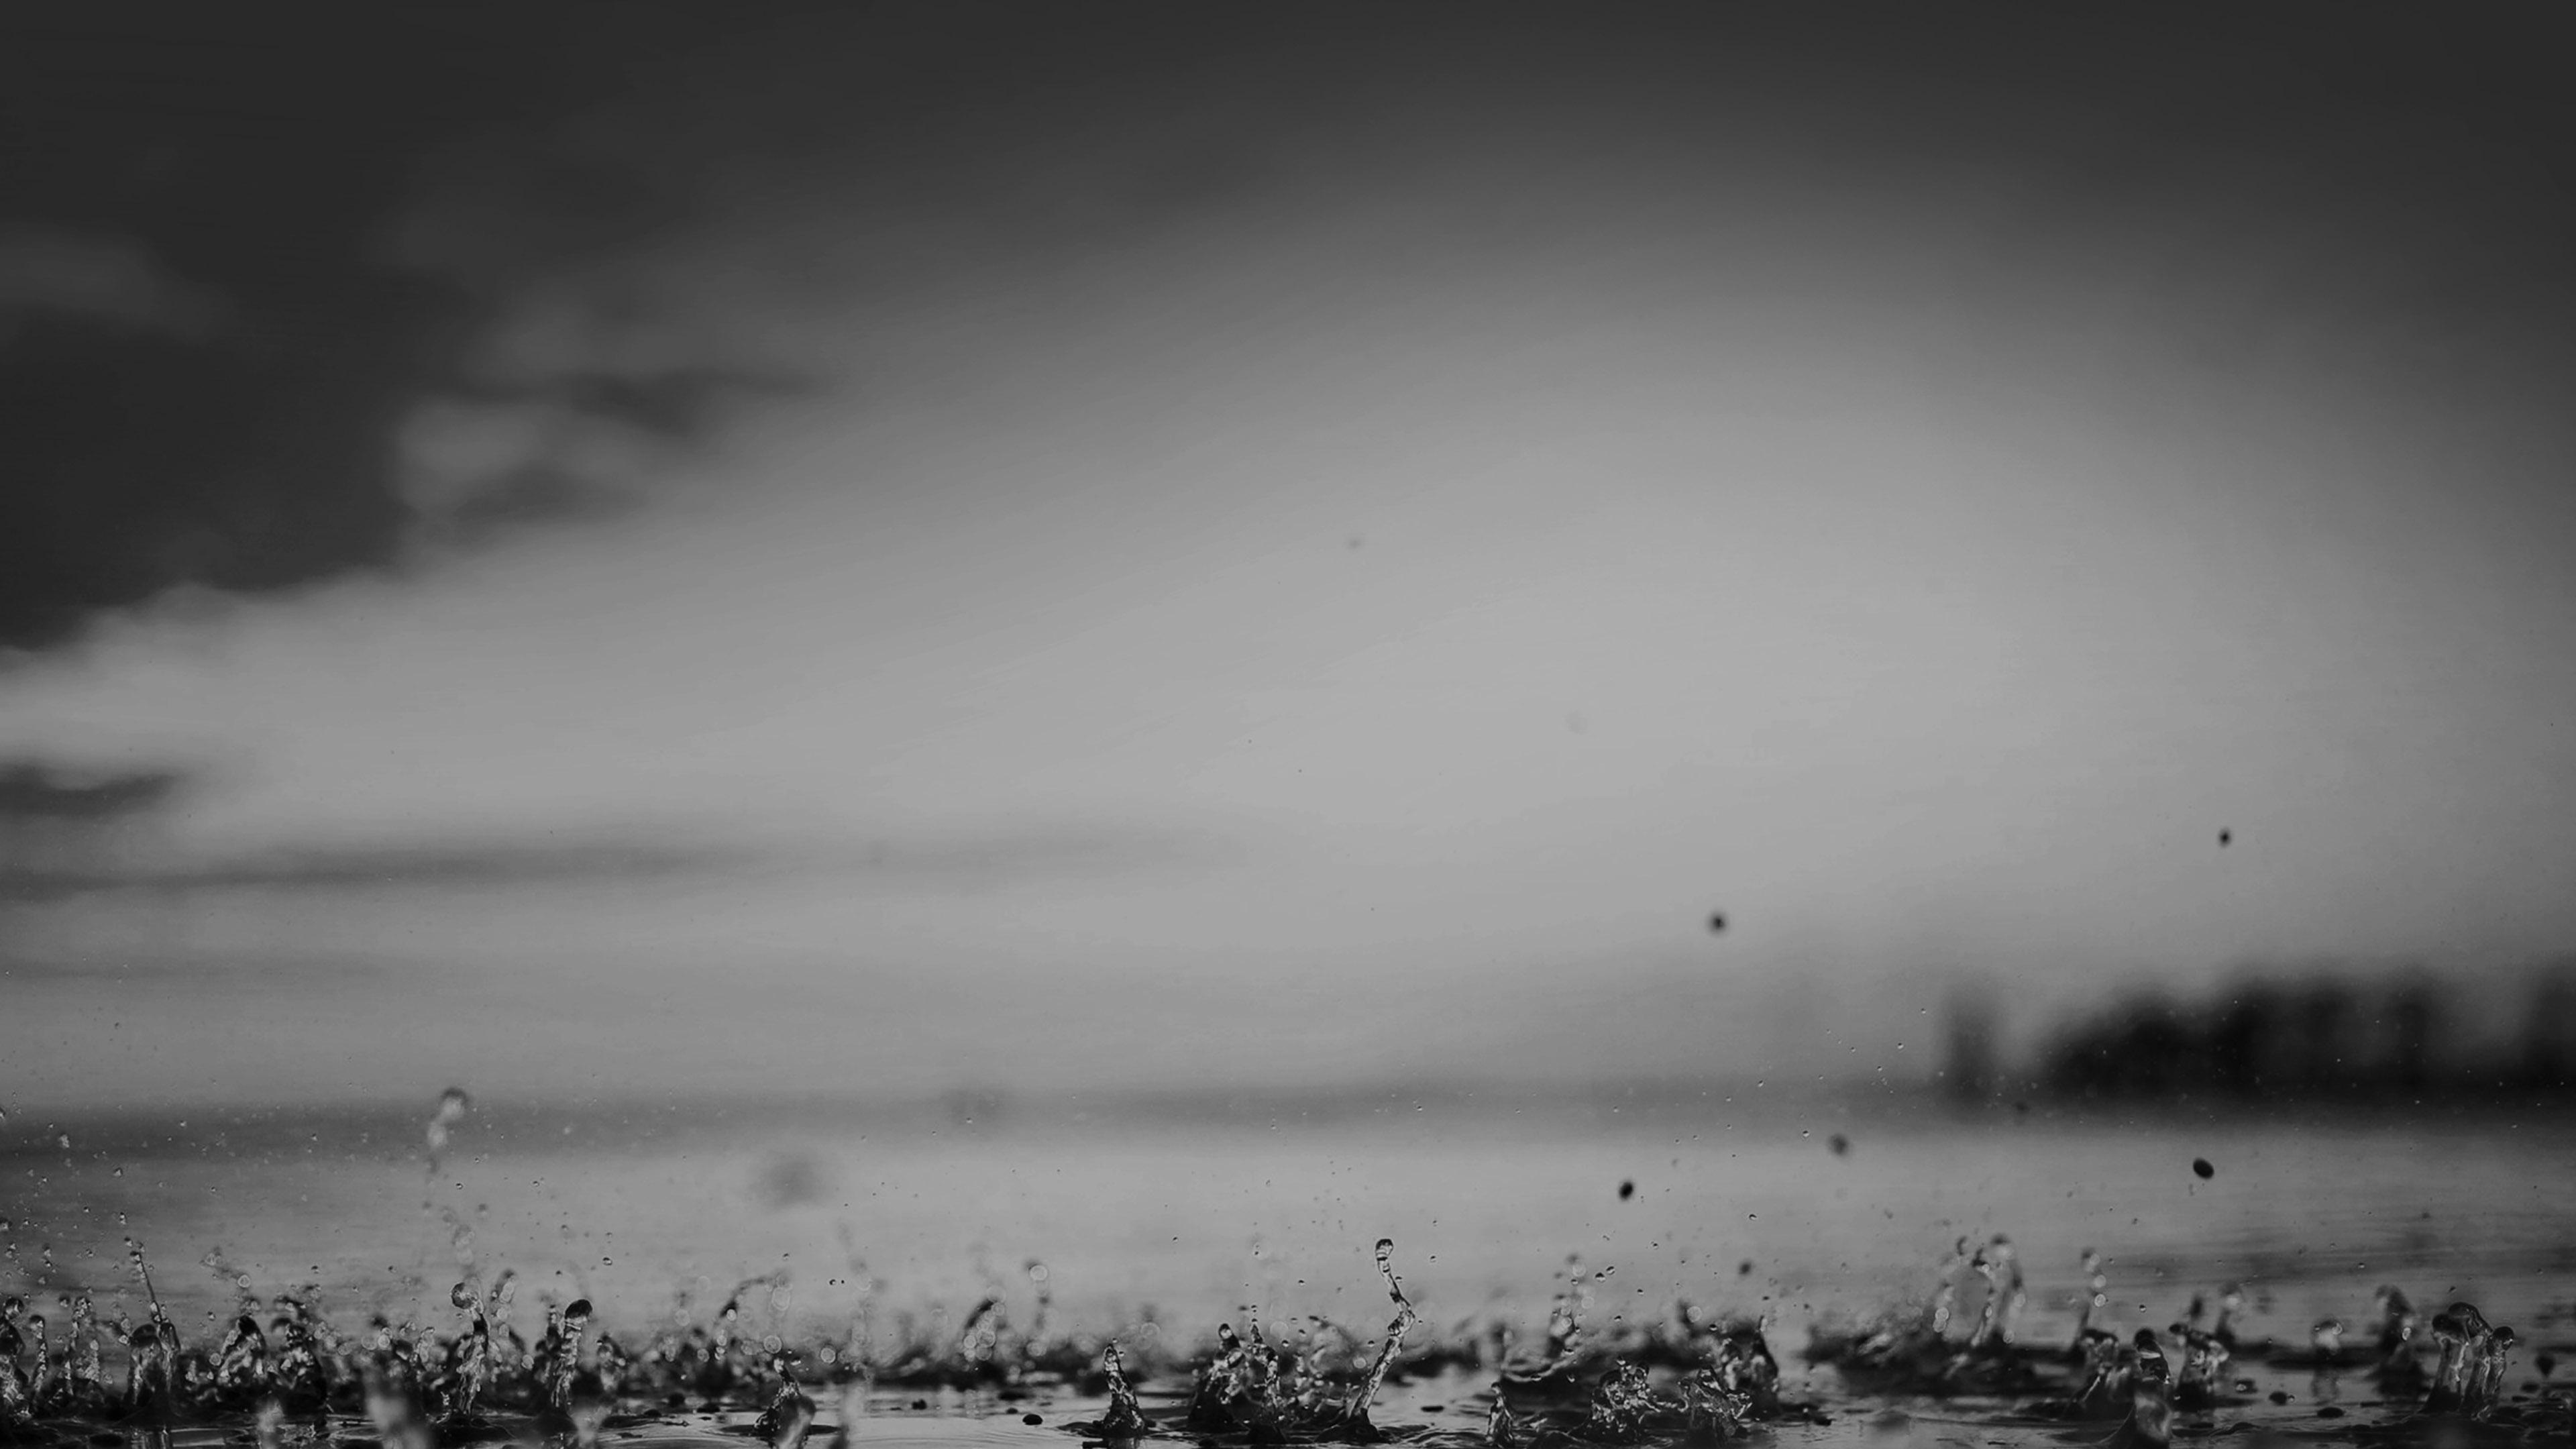 black rain essays Essays and criticism on arna bontemps' black thunder - critical essays.